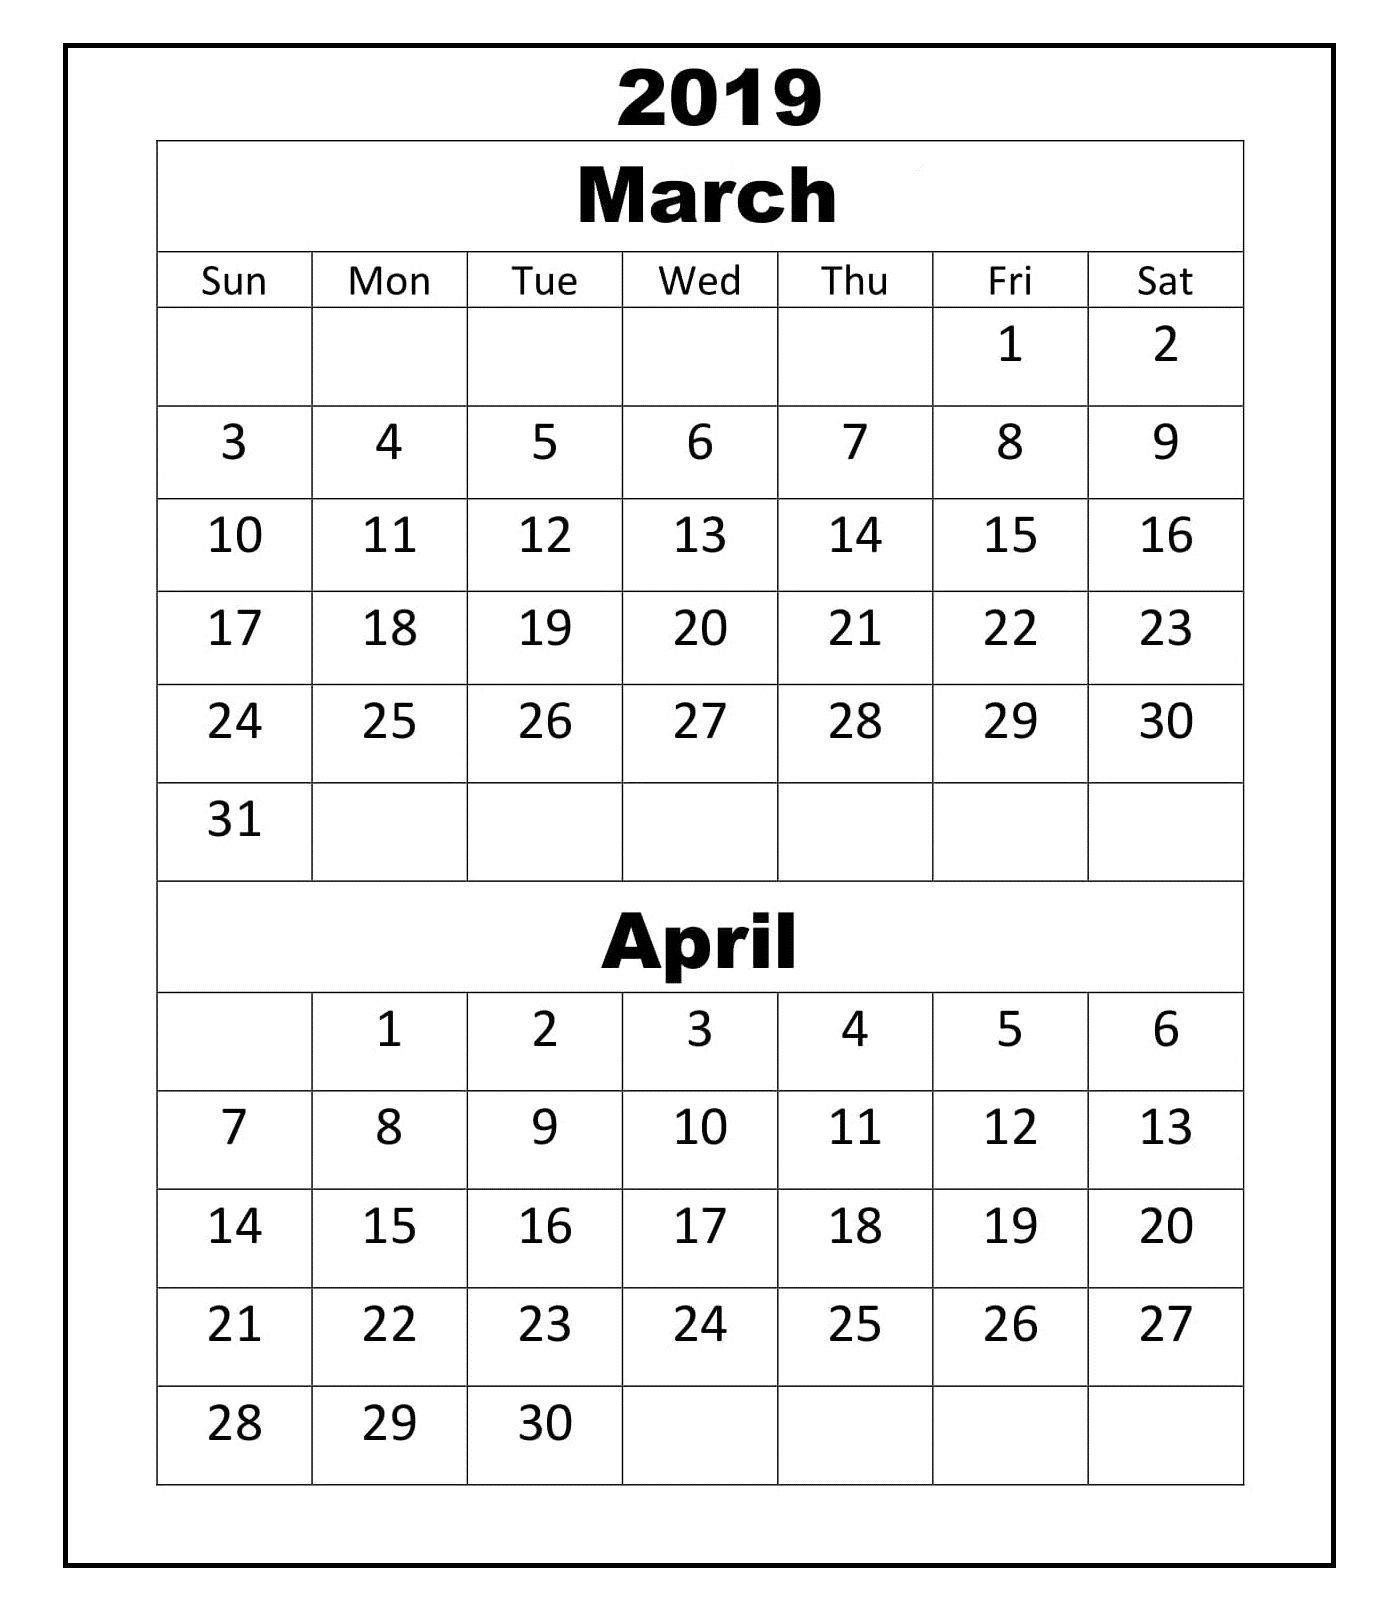 March April 2019 Calendar Academic | March April 2019 Calendar For Calendar 2019 March April